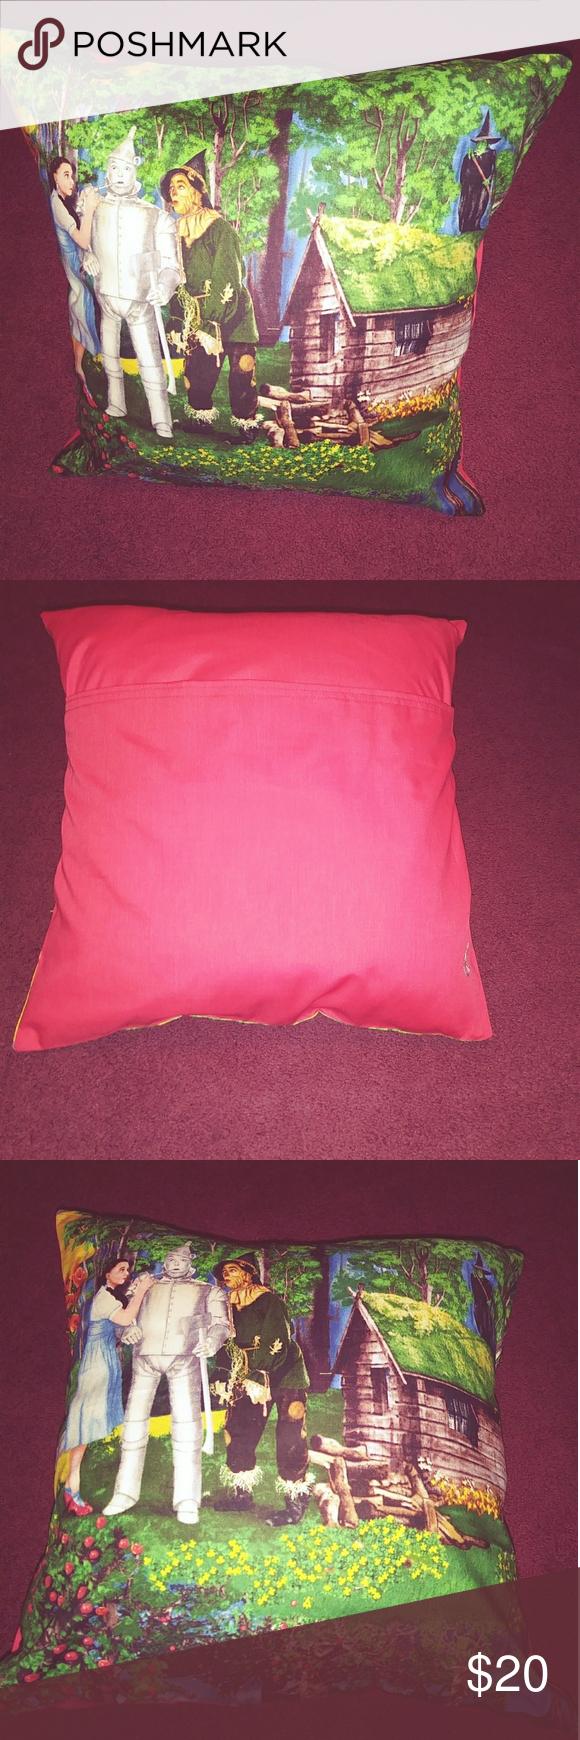 Wizard of Oz throw pillow 16x16 inch throw pillow with a home made envelope pill  Wizard of Oz throw pillow 1616 inch throw pillow with a home made envelope pillow case o...